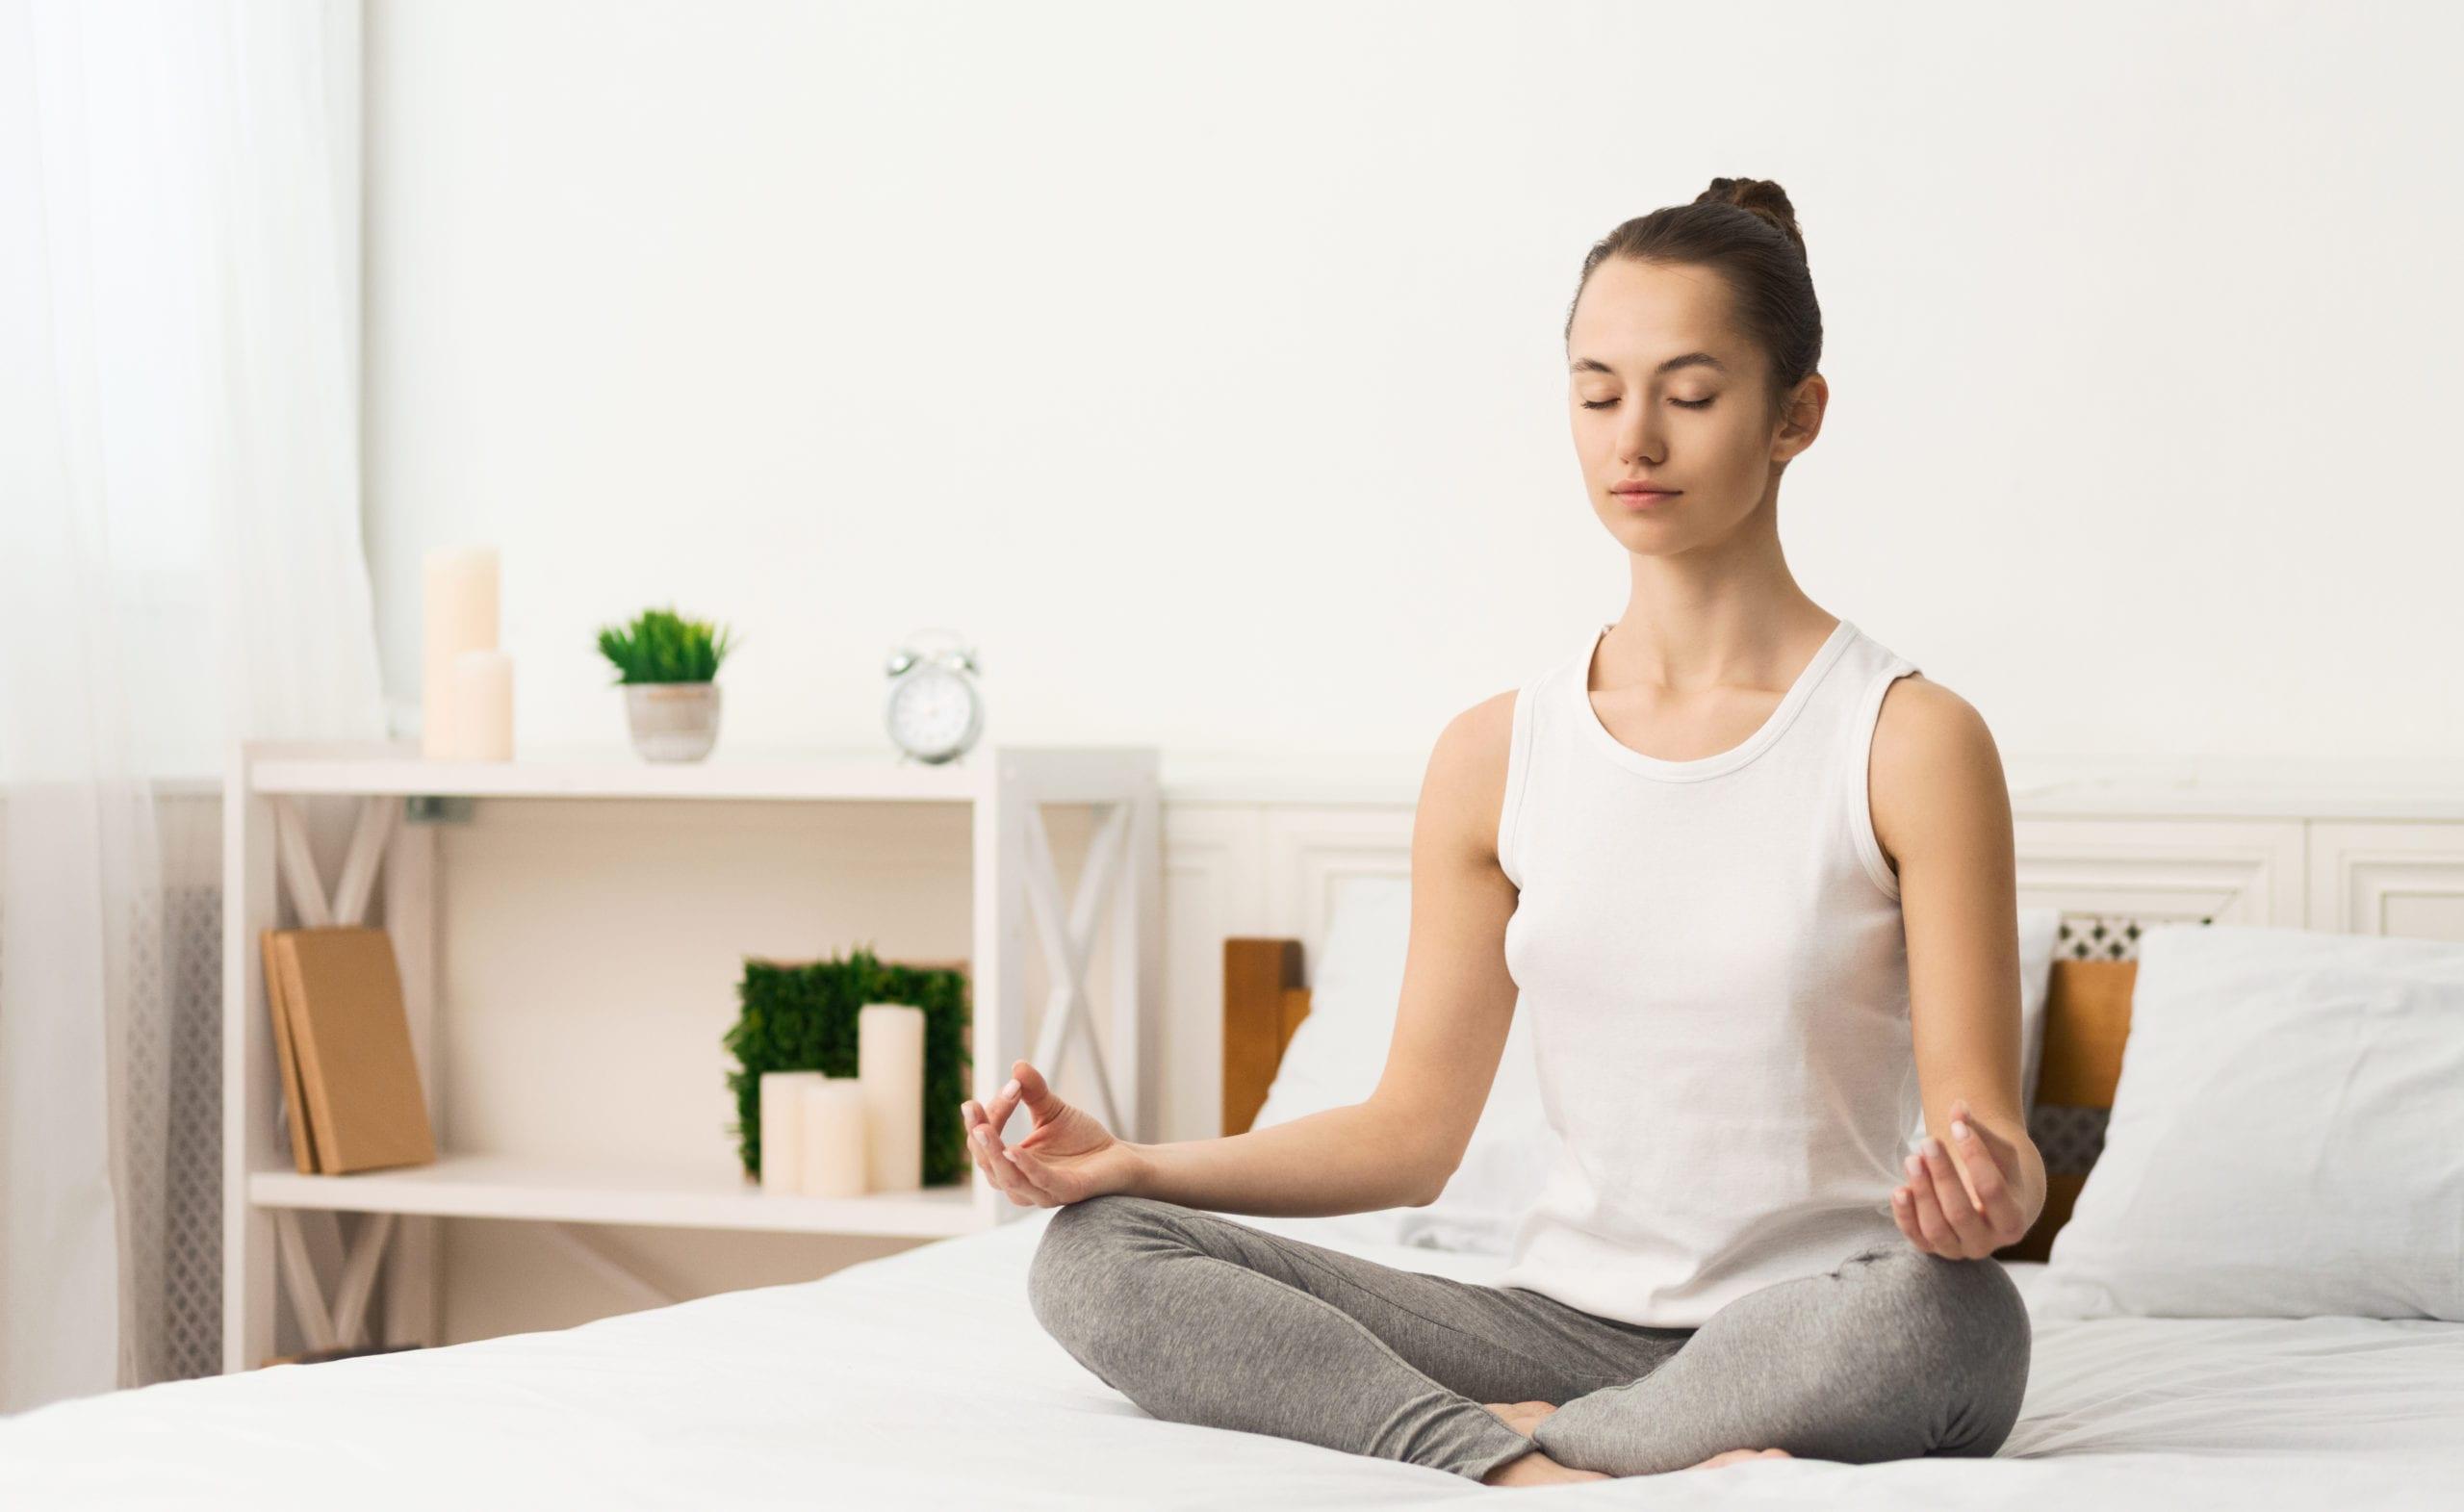 Can Mindfulness Meditation Work For Addiction